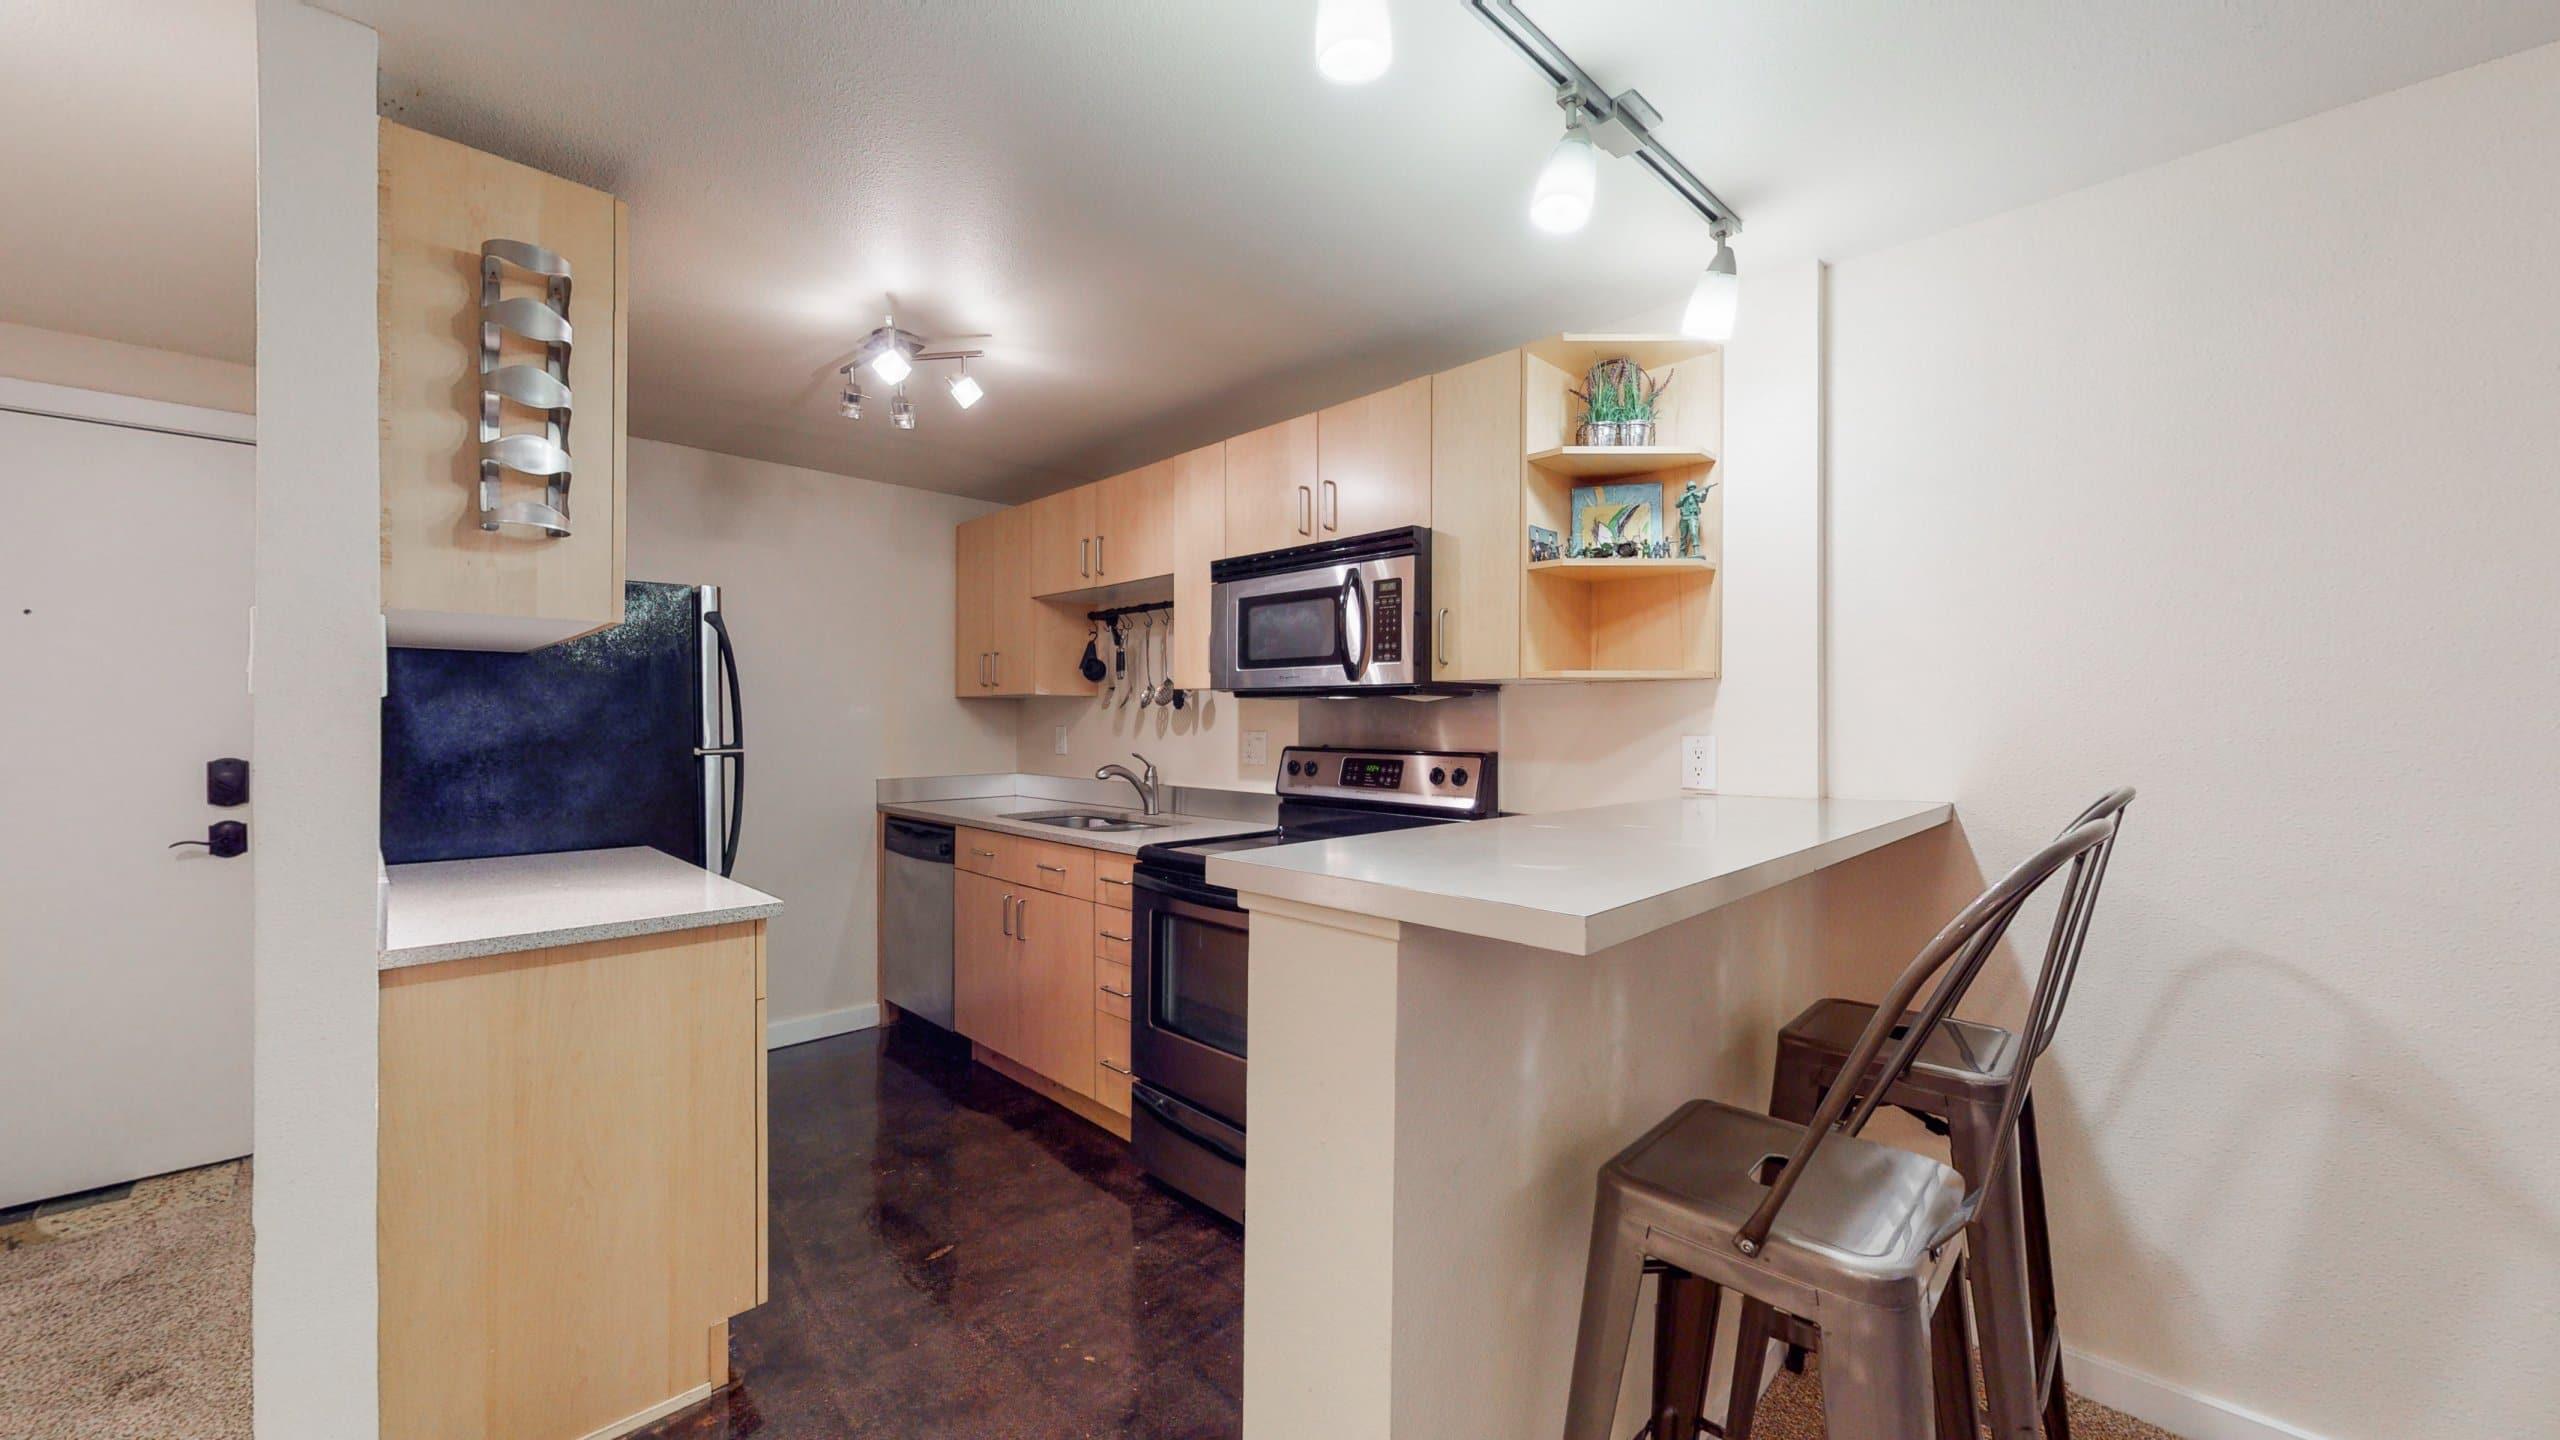 Congress Park Condo Kitchen with Corian Counters